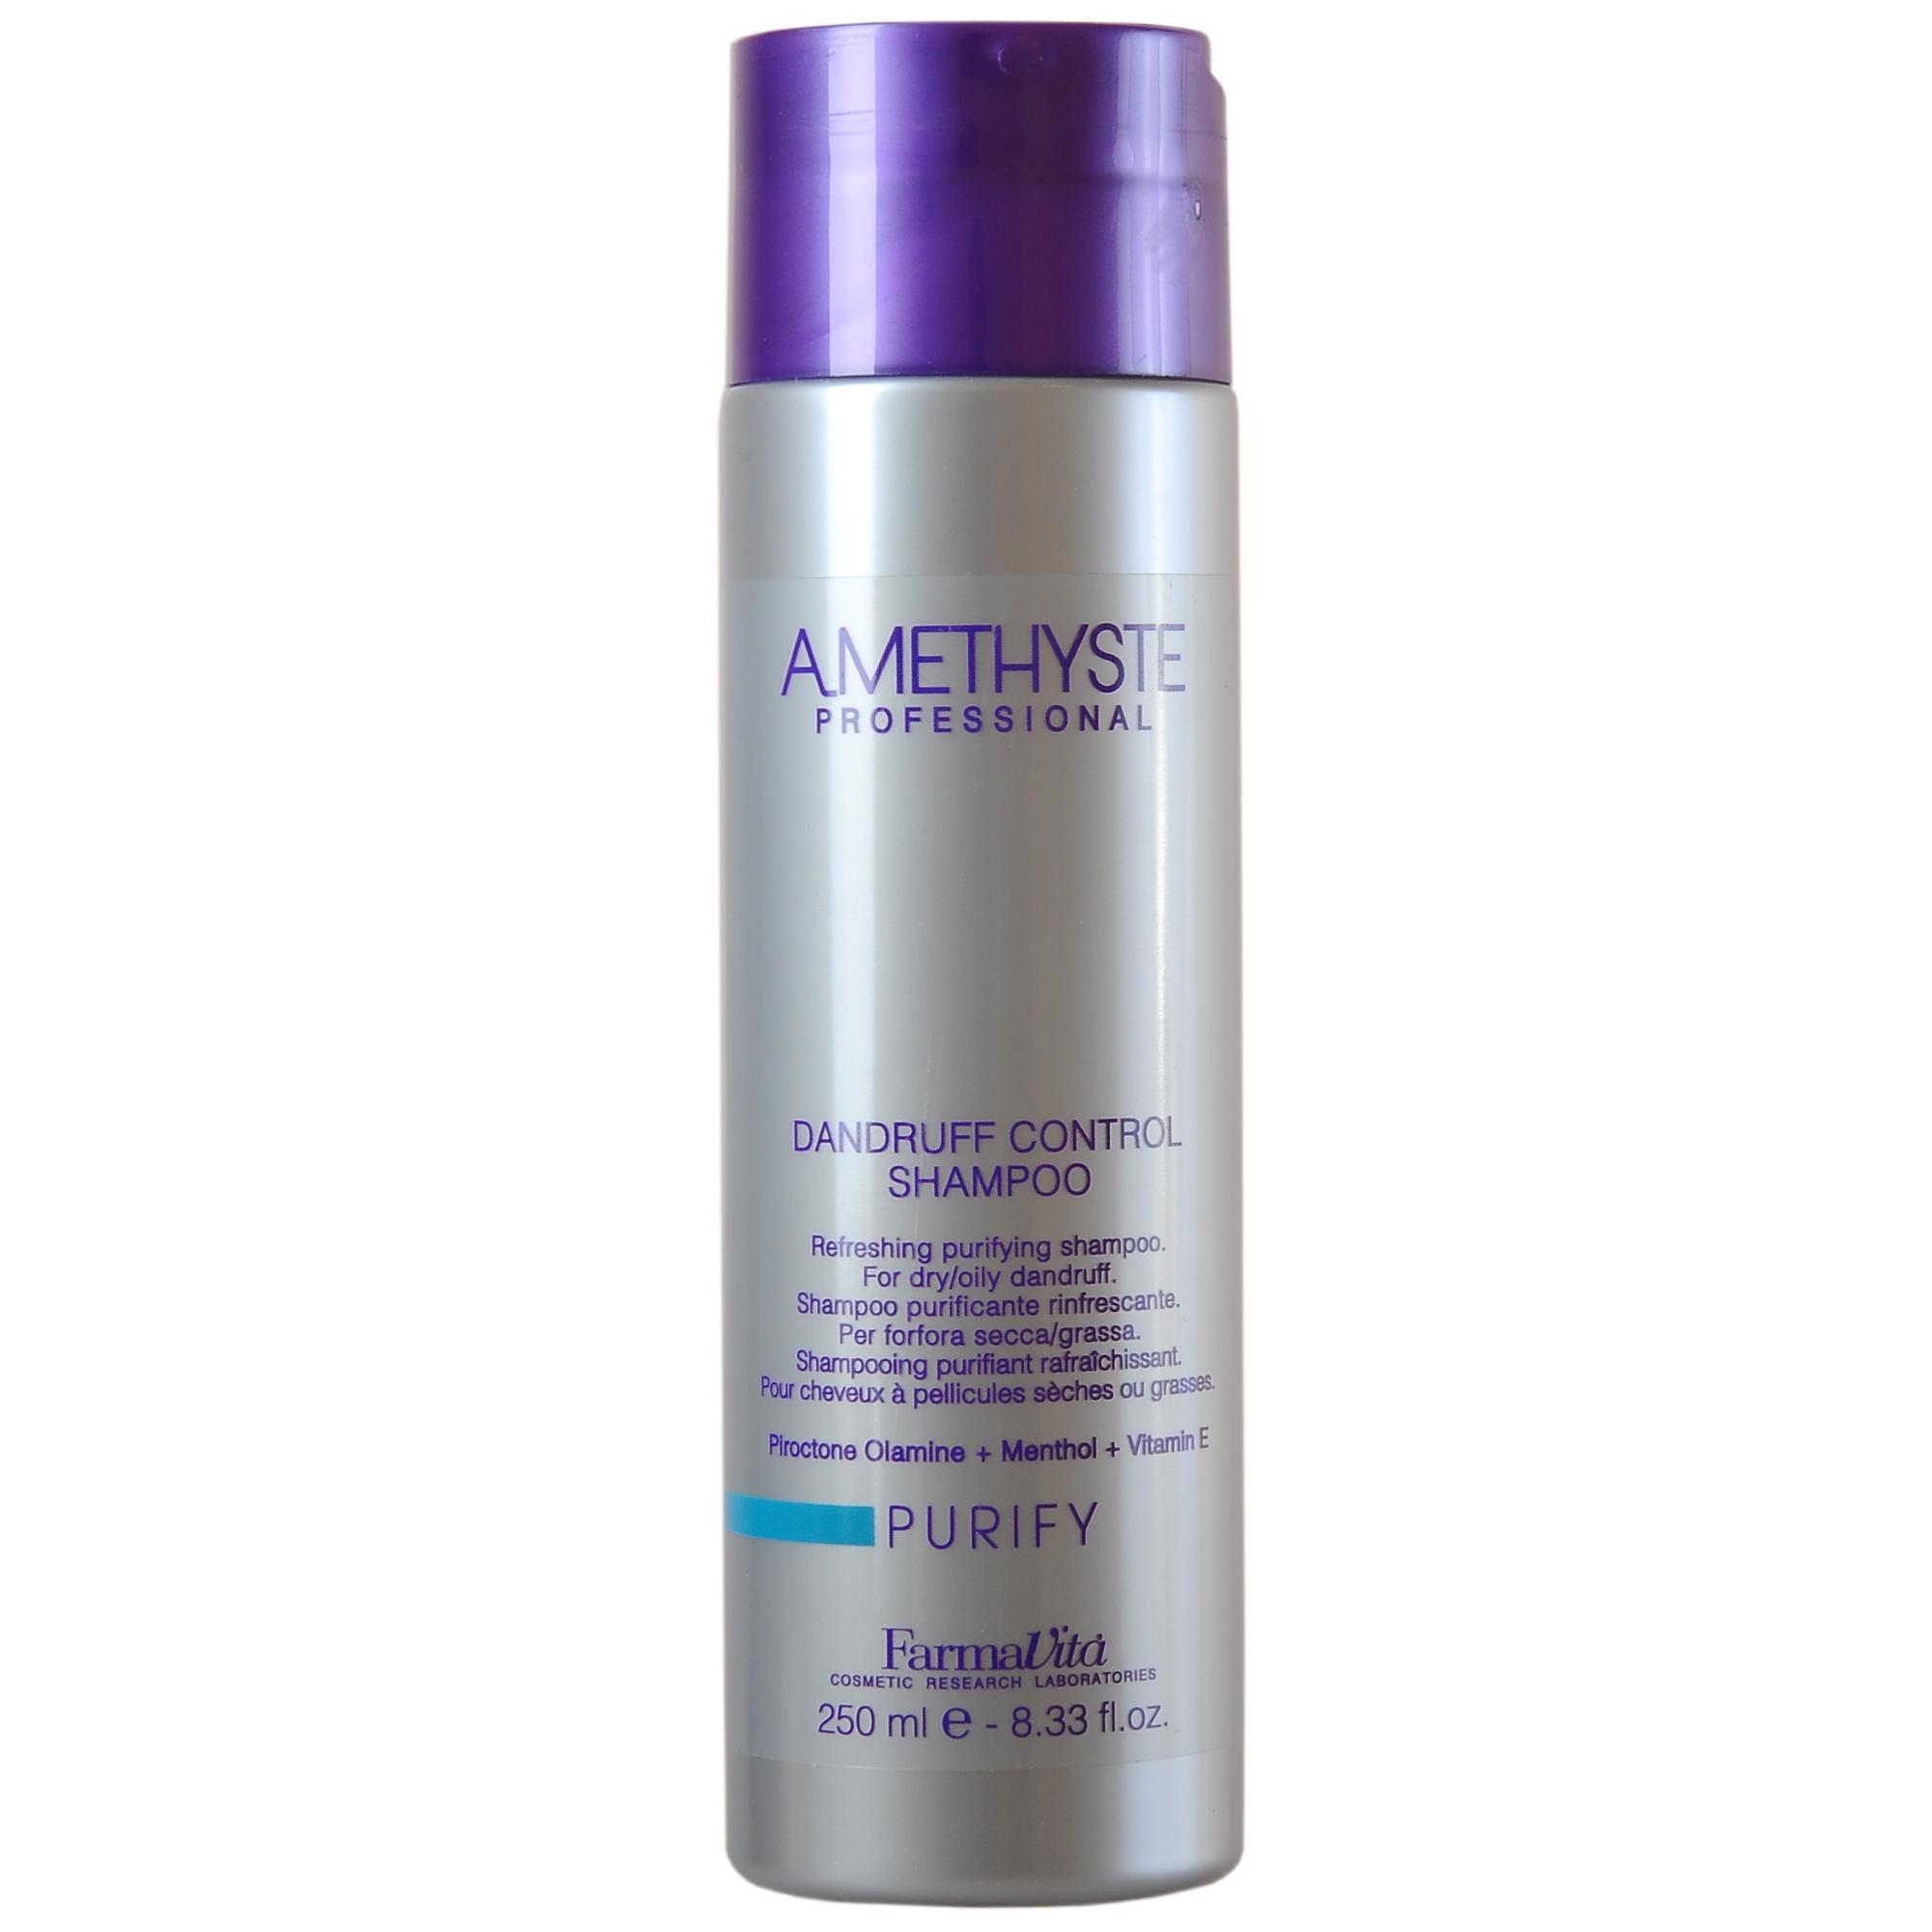 FARMAVITA Шампунь против перхоти / Amethyste purify dandruff controll shampoo 250мл недорого